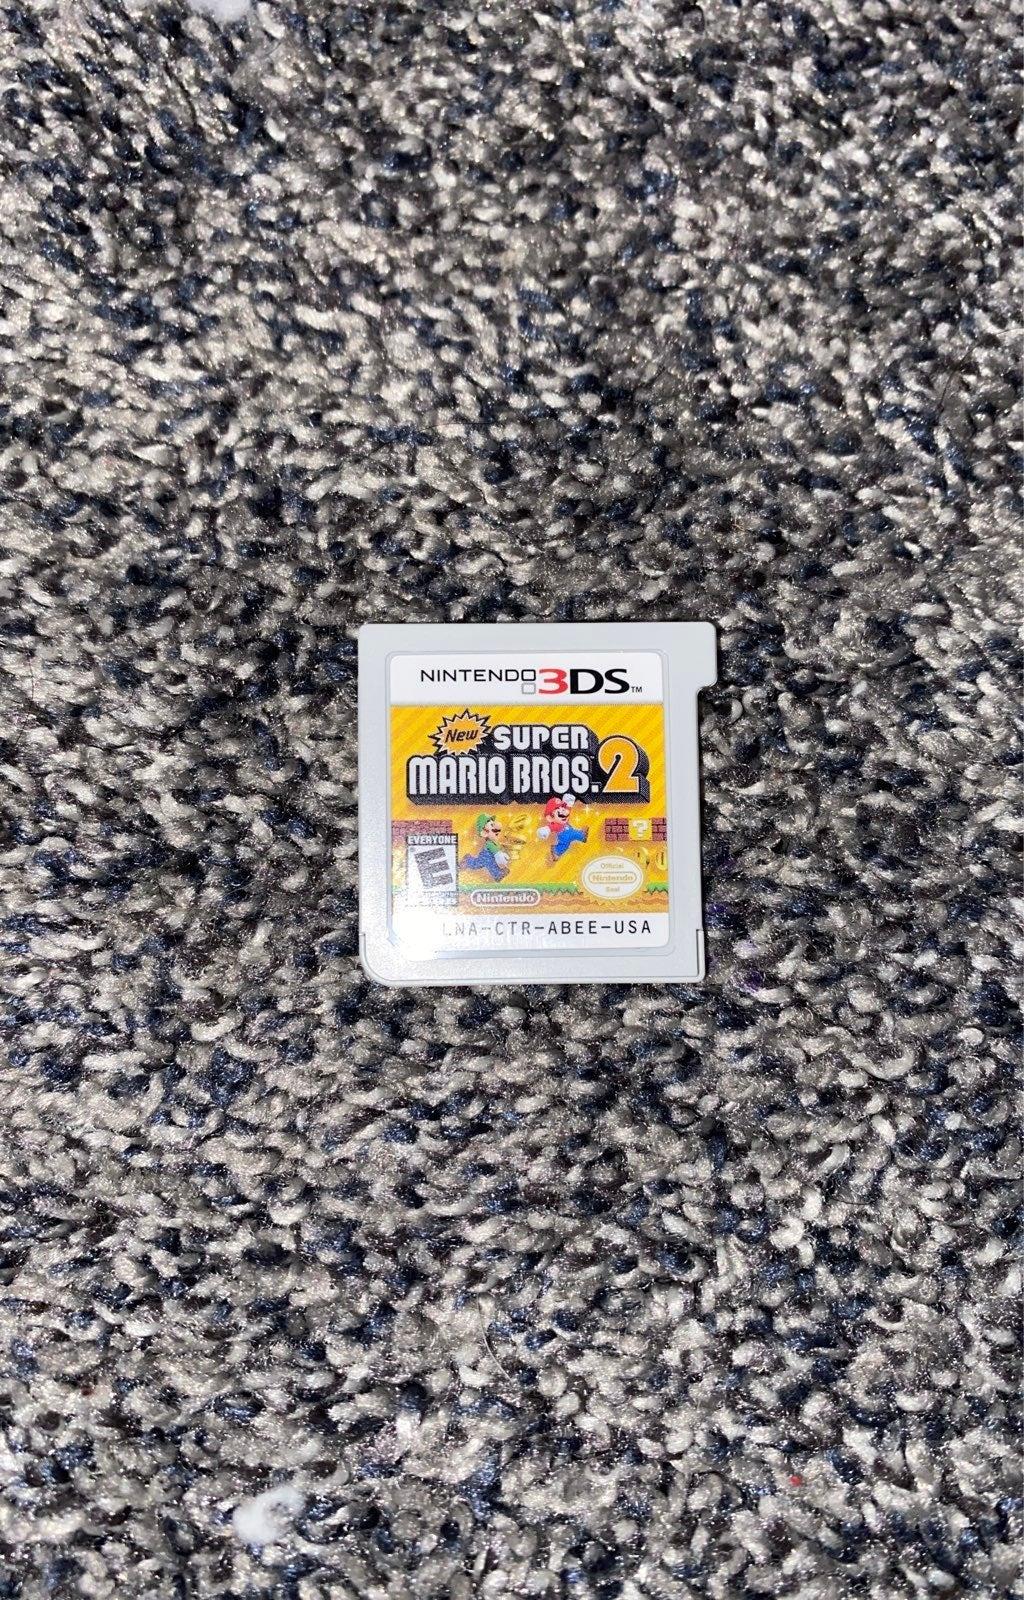 Super Mario Bros. 2 Nintendo 3DS